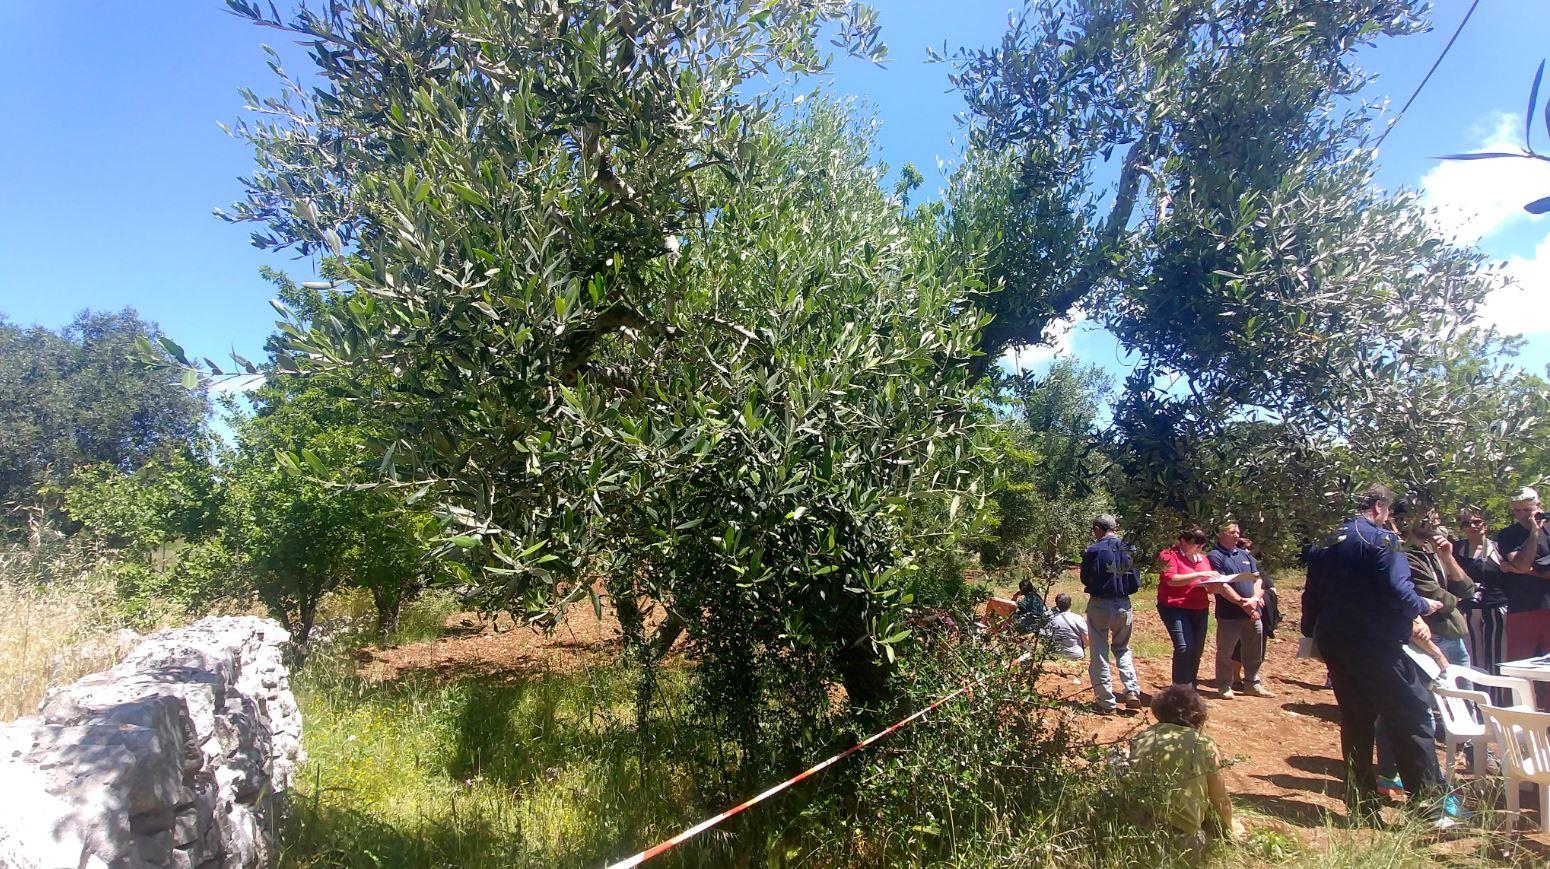 Photos © Elena Tioli - www.vivicomemangi.it